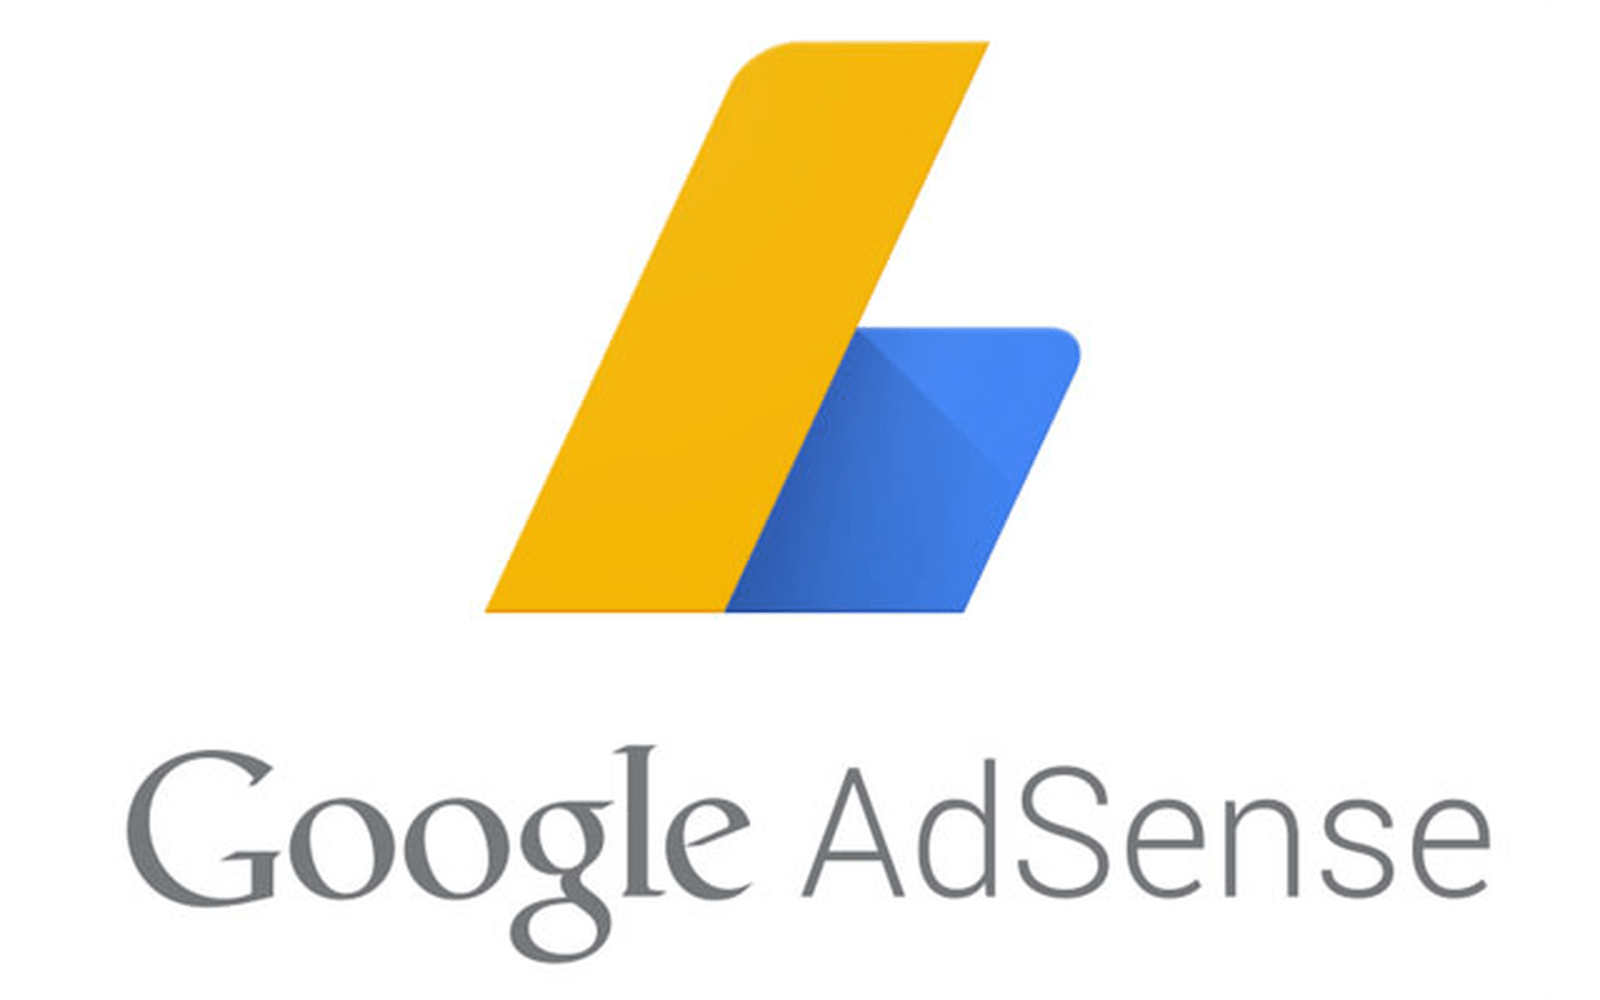 Google gives its AdSense website a fresh Material Design overhaul.